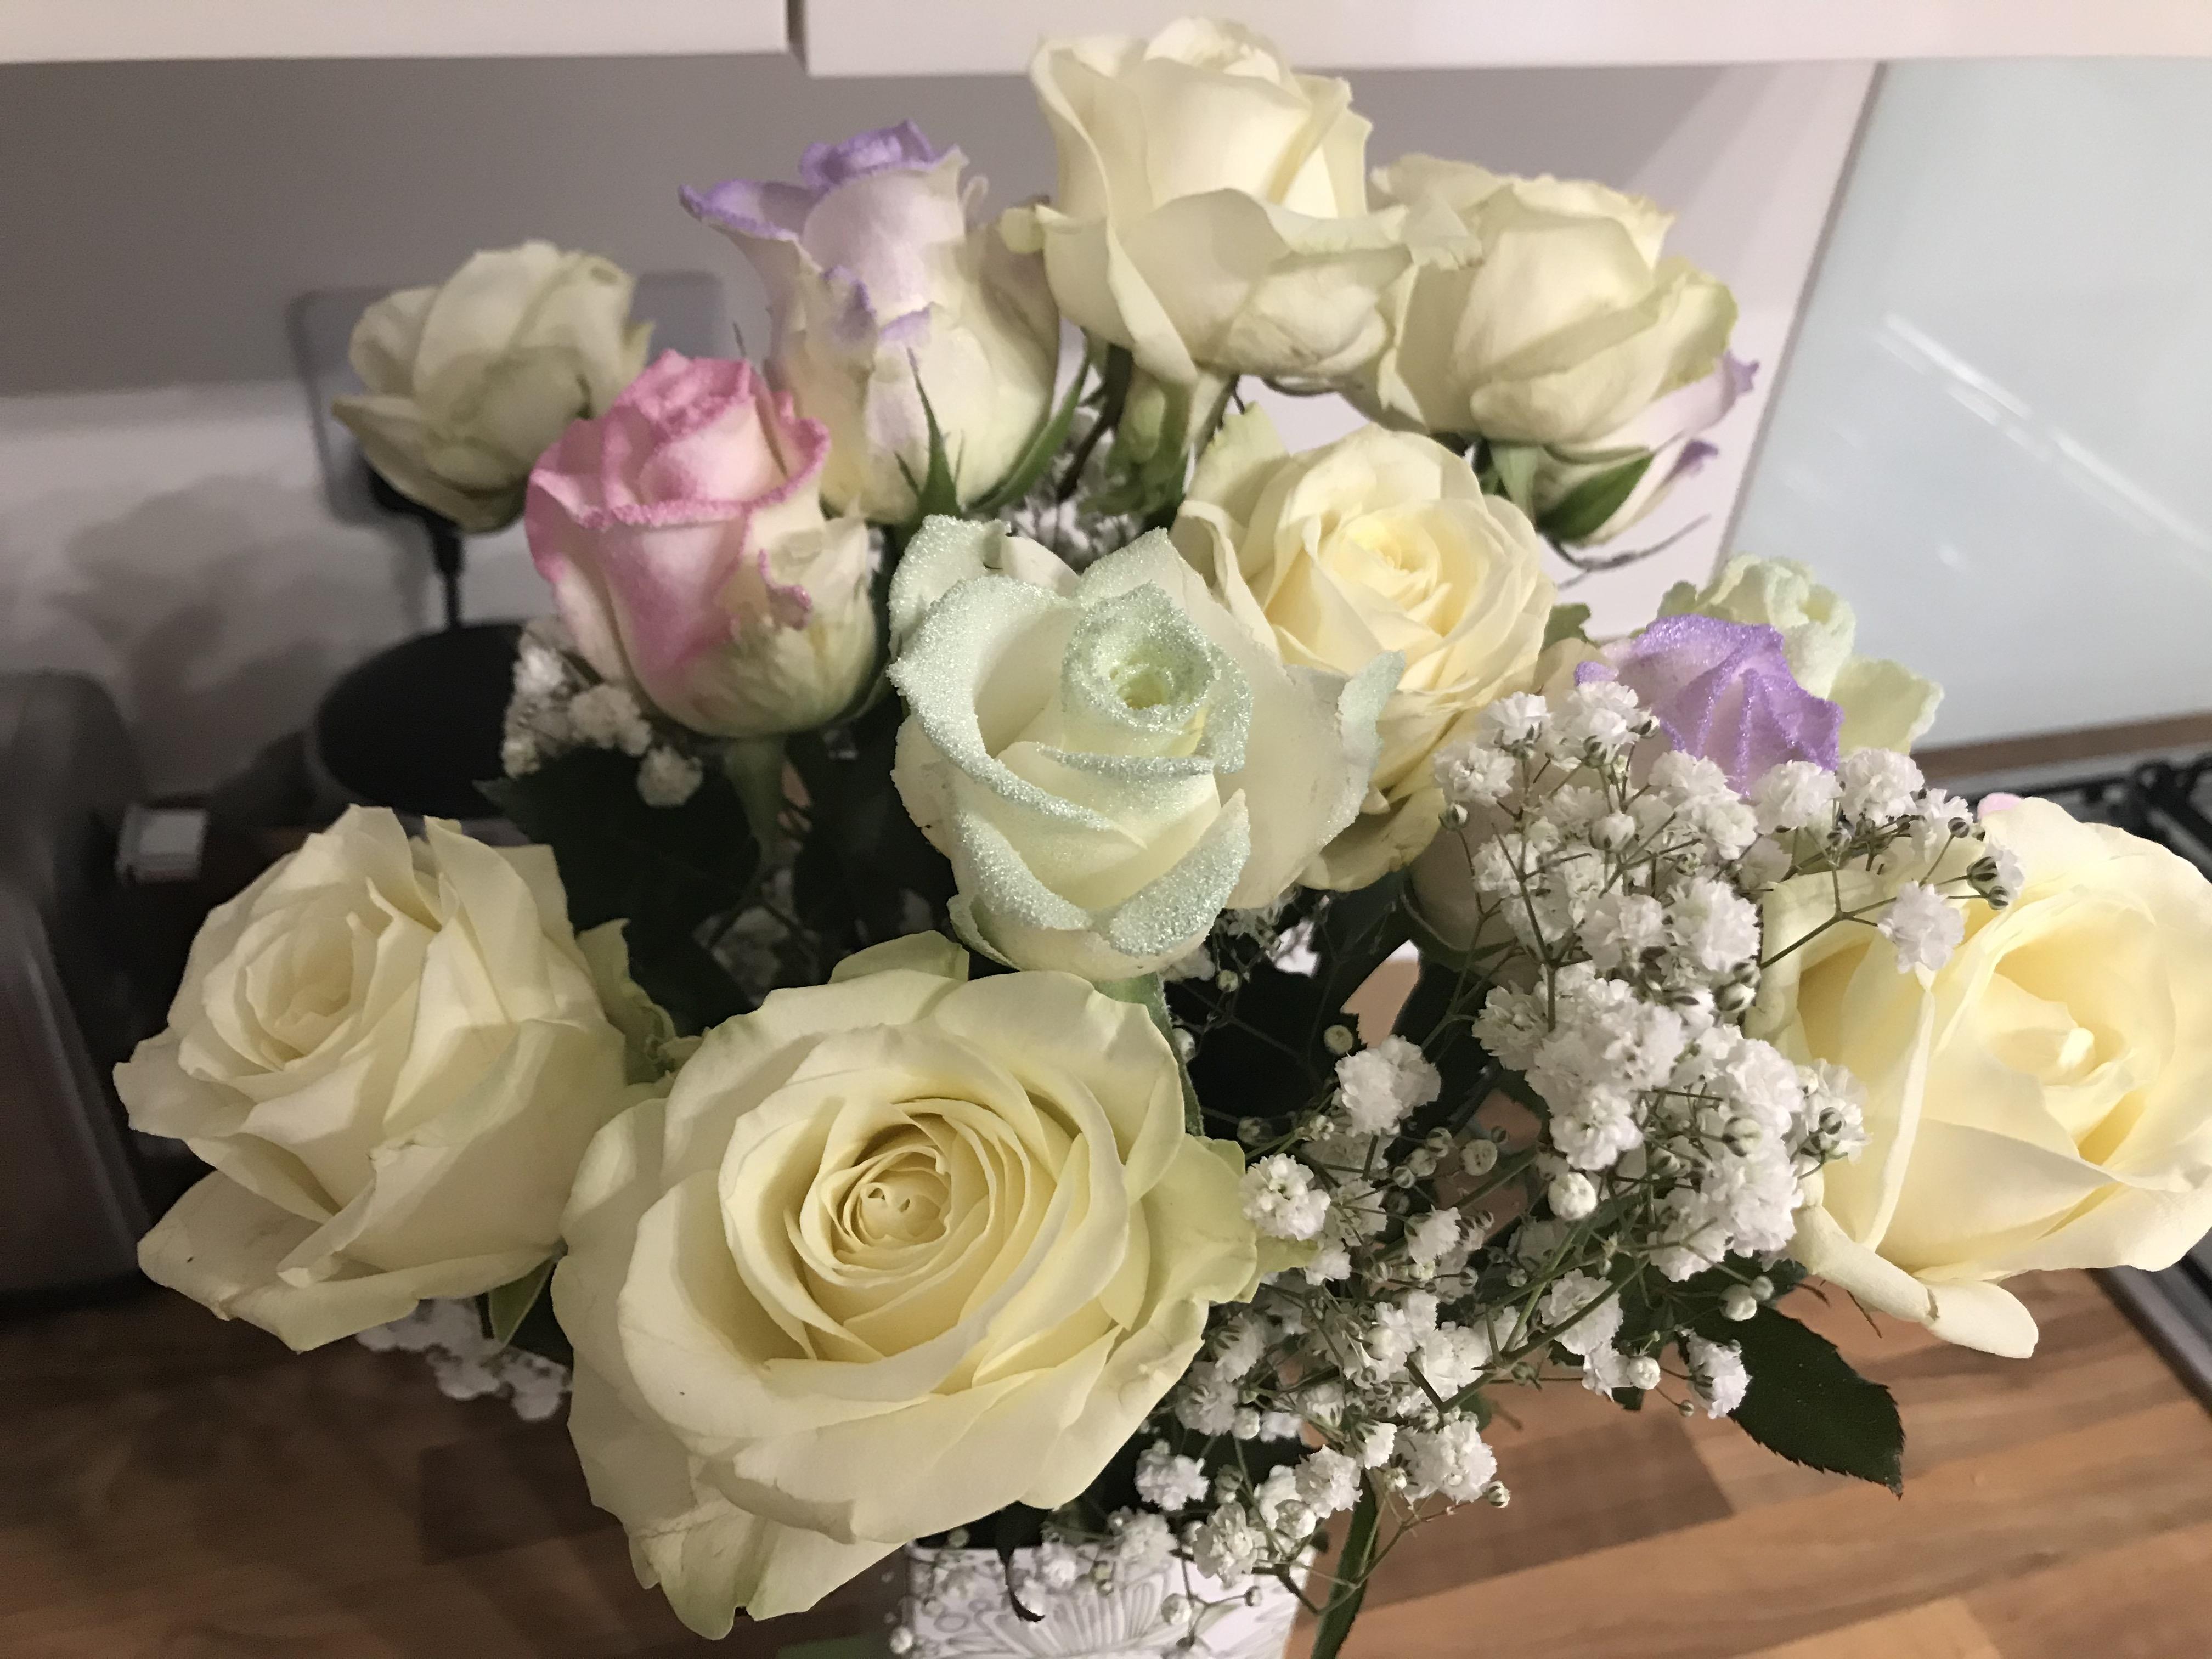 123 Flowers Unicorn Roses